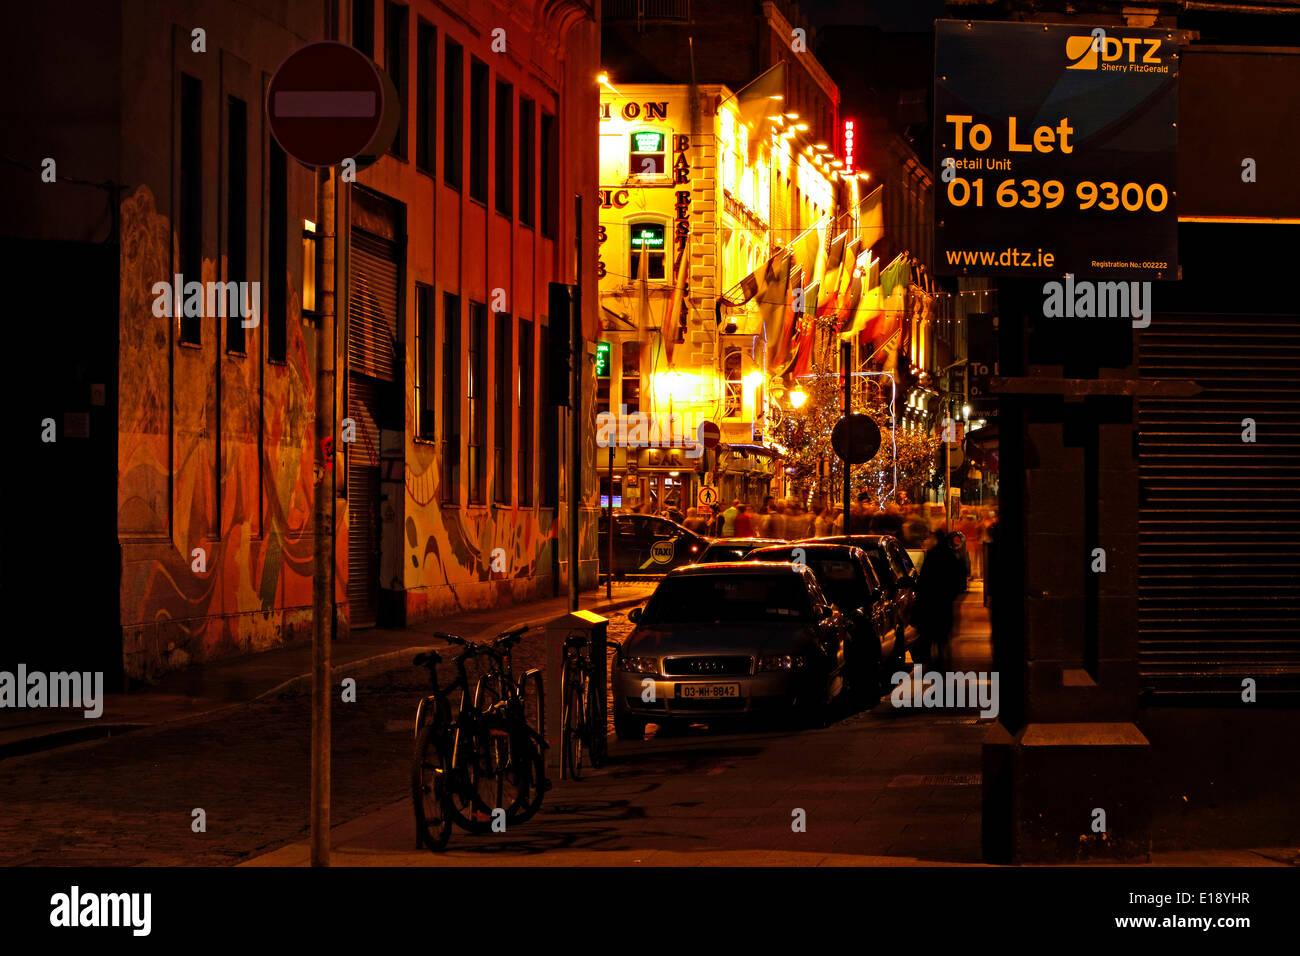 Street at night in Temple Bar, Dublin, Republic of Ireland, Europe. - May 2014 - Stock Image